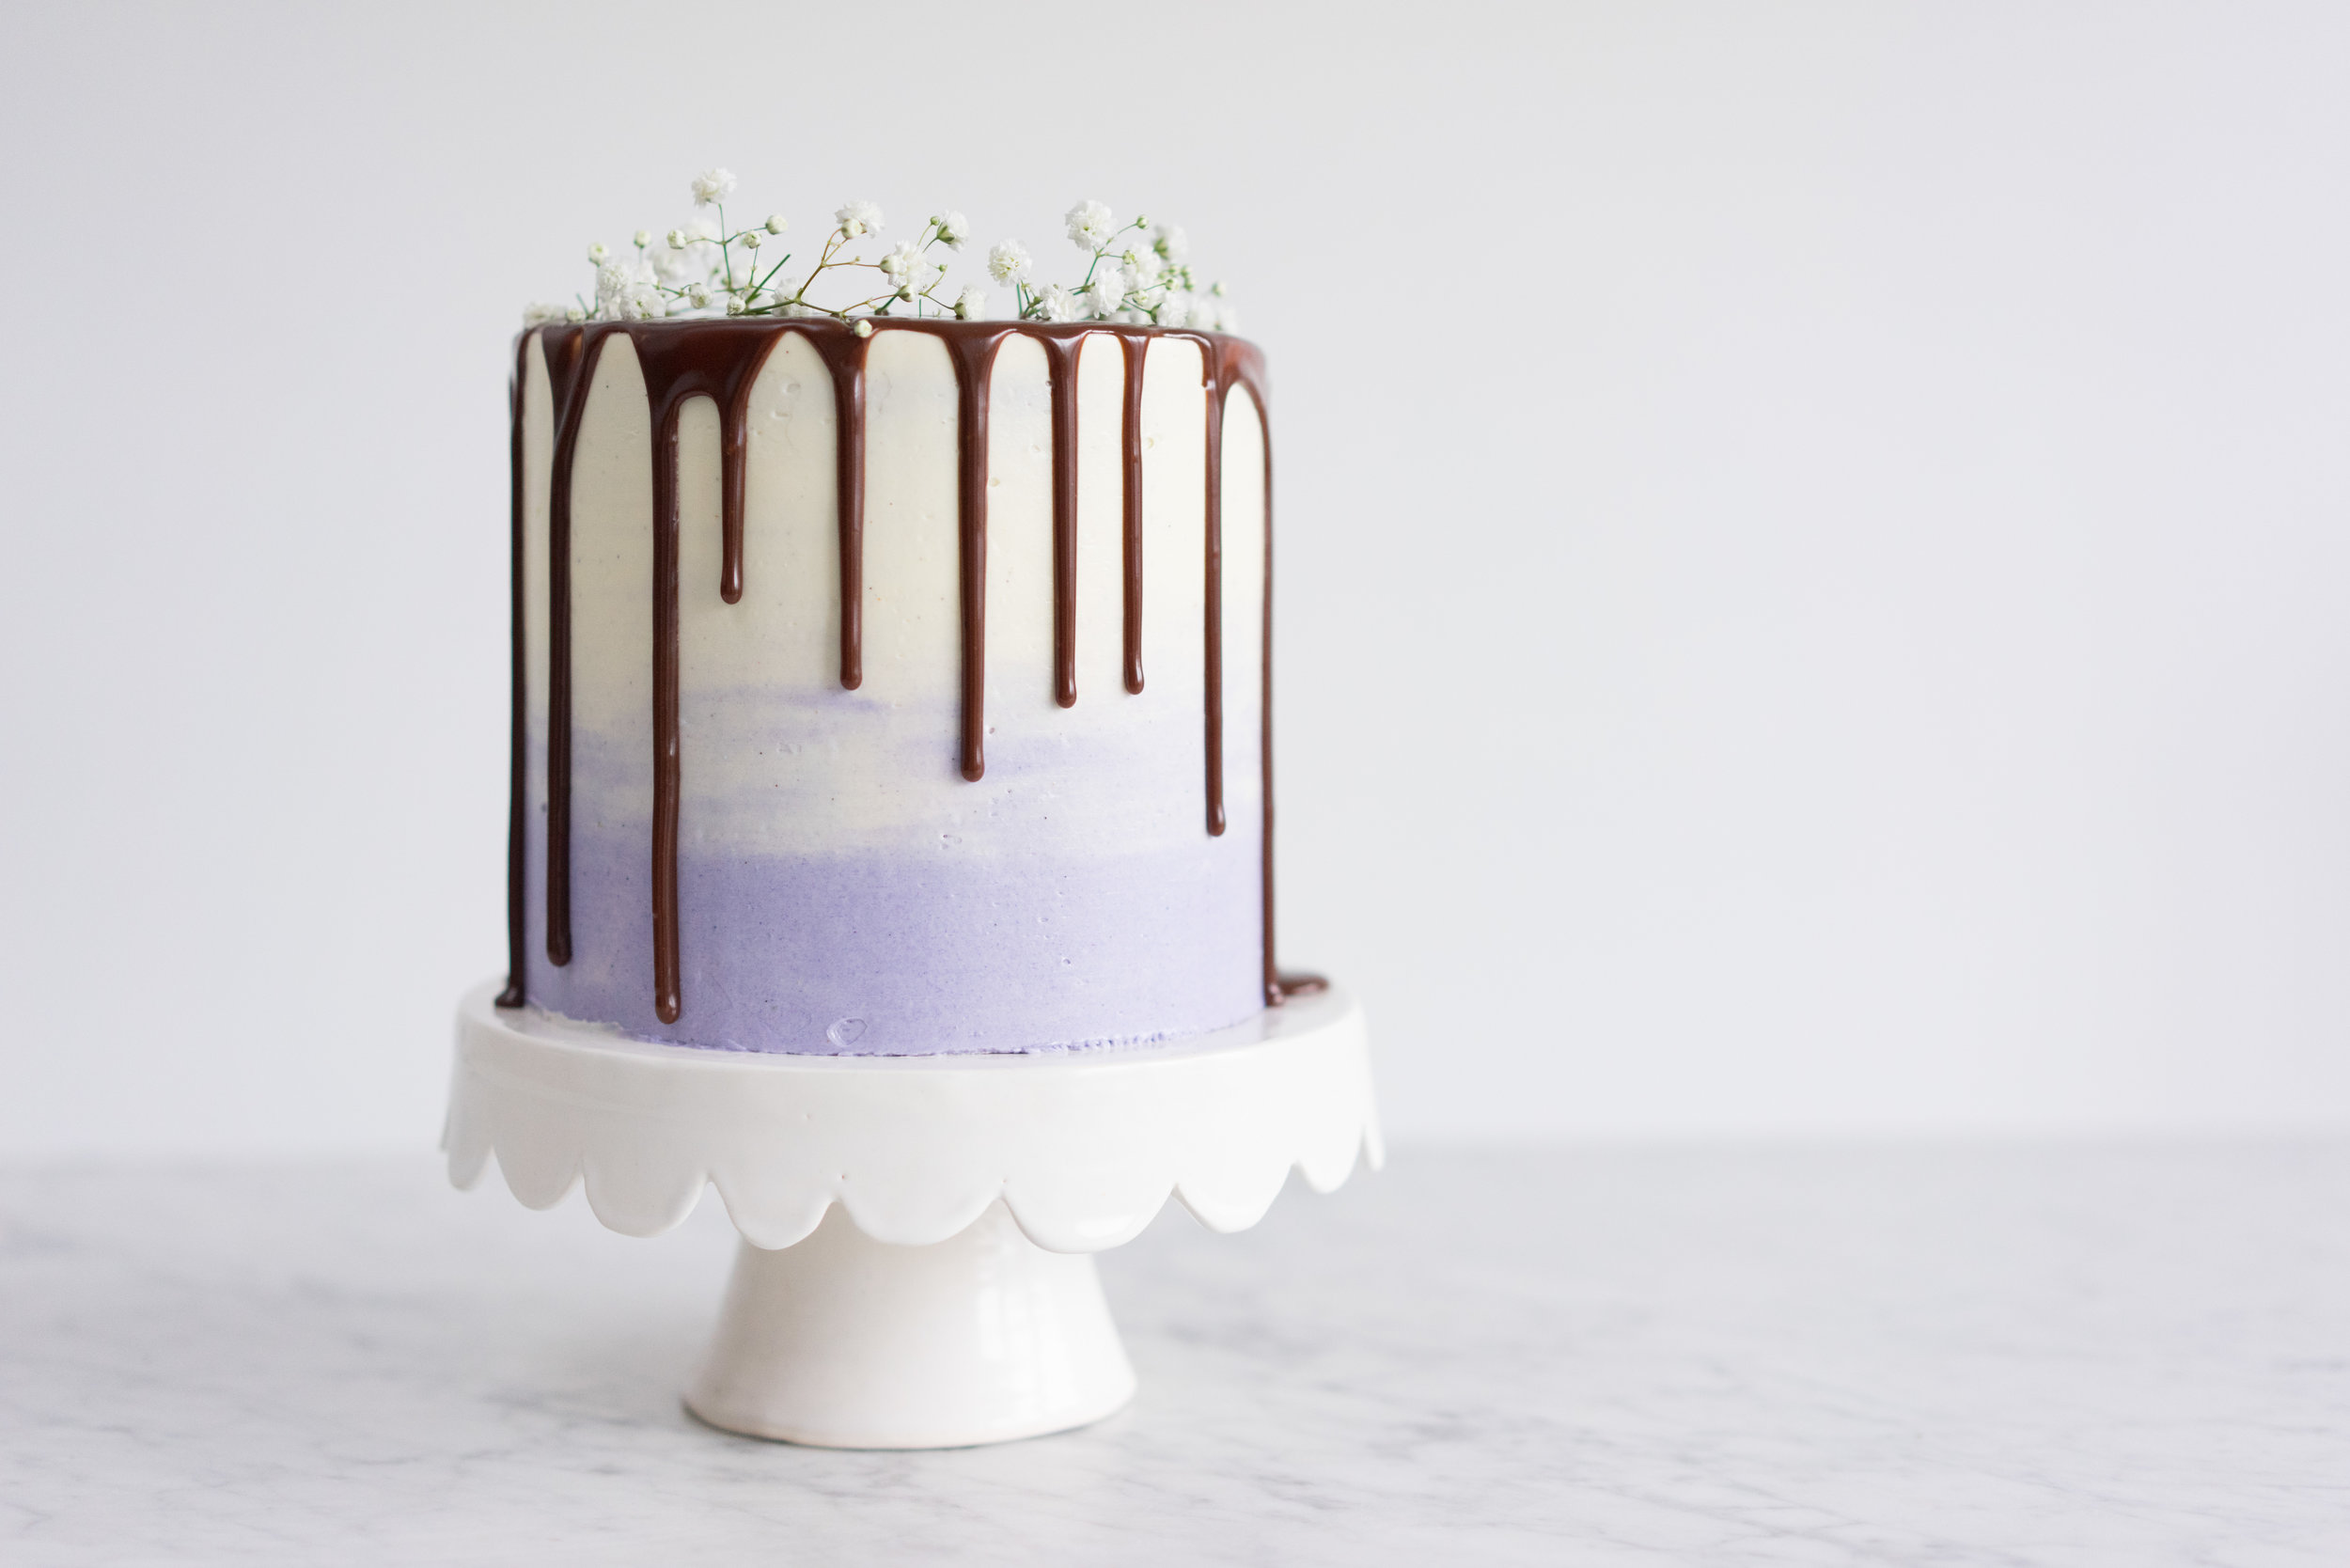 Honey lavender cake with vanilla german buttercream and lavender milk chocolate ganache drip